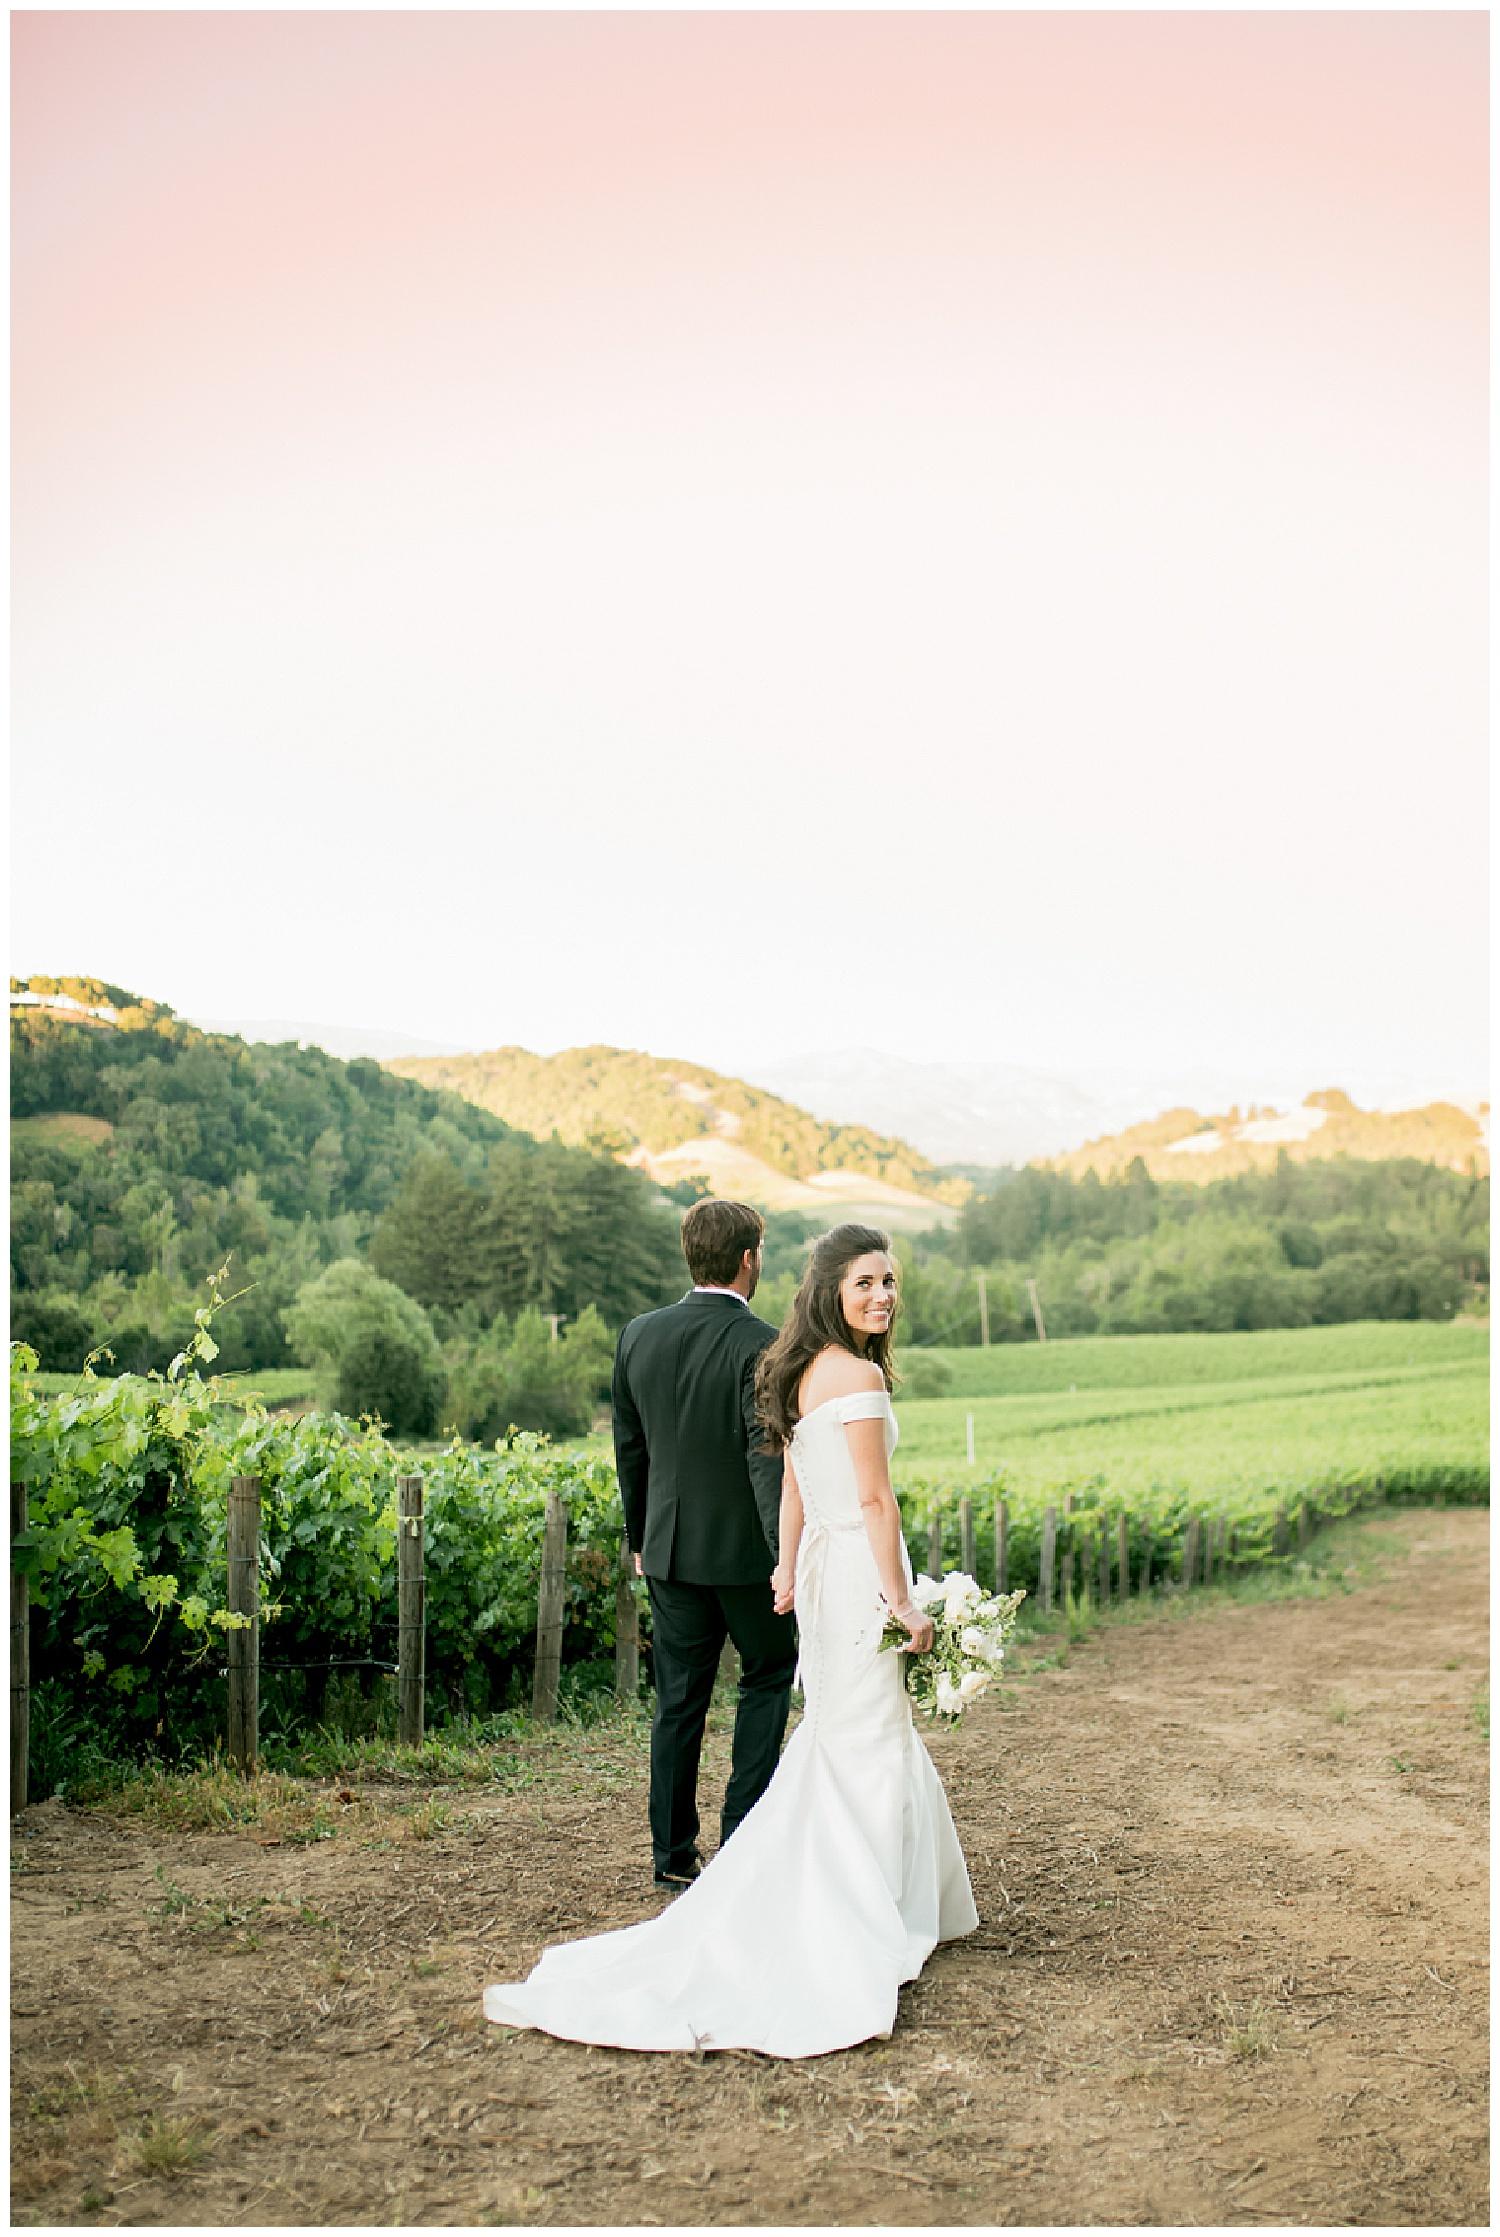 Janine_Licare_Photography_San_Francisco_Wedding_Photographer_0149.jpg